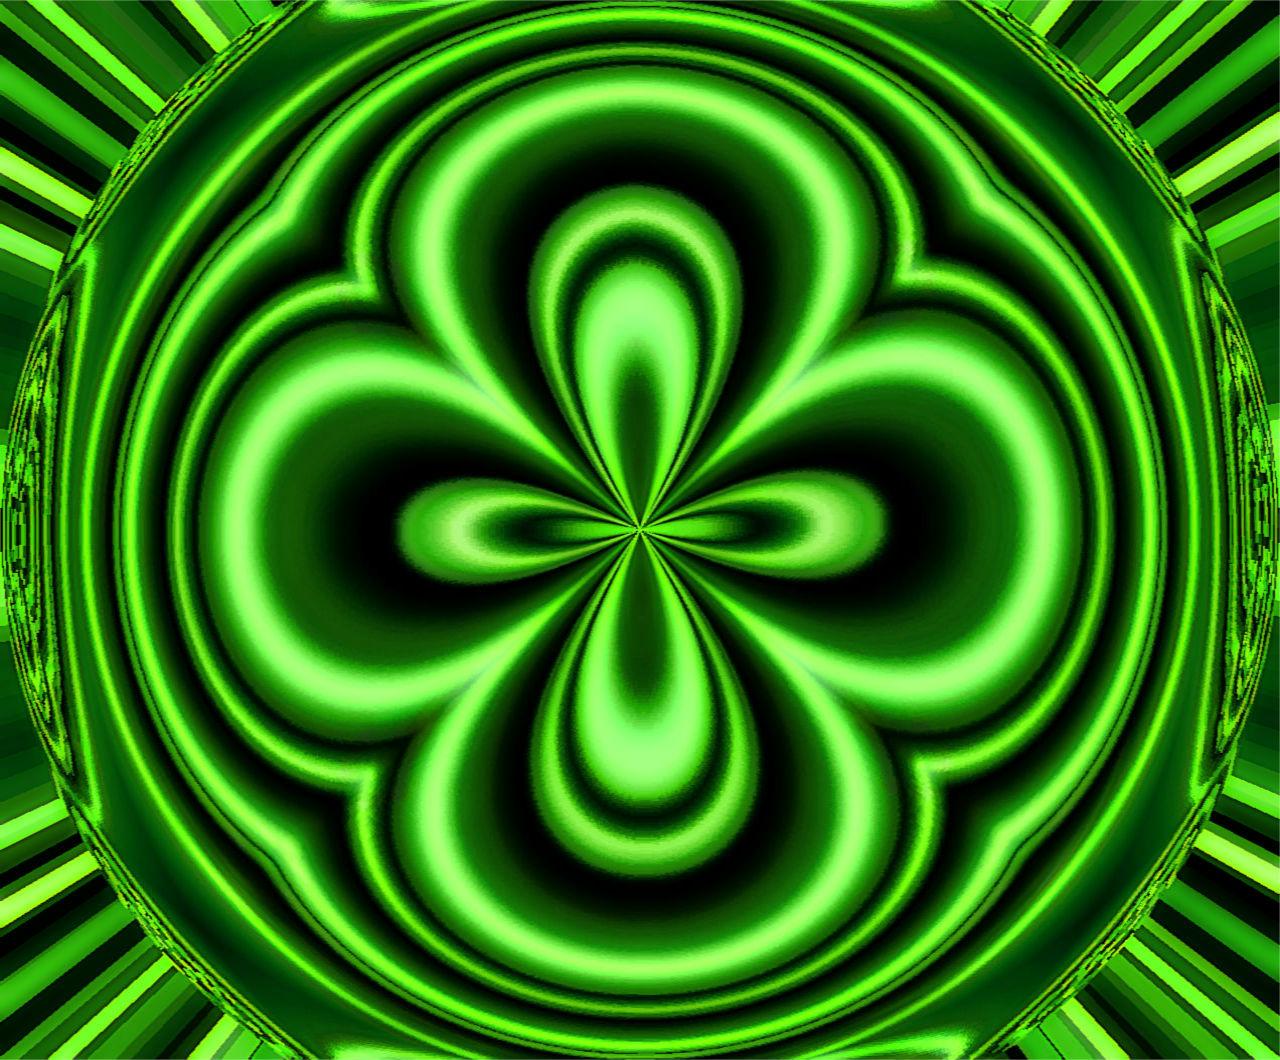 Four Leaf Clover Computer Wallpapers Desktop Backgrounds 1280x1060